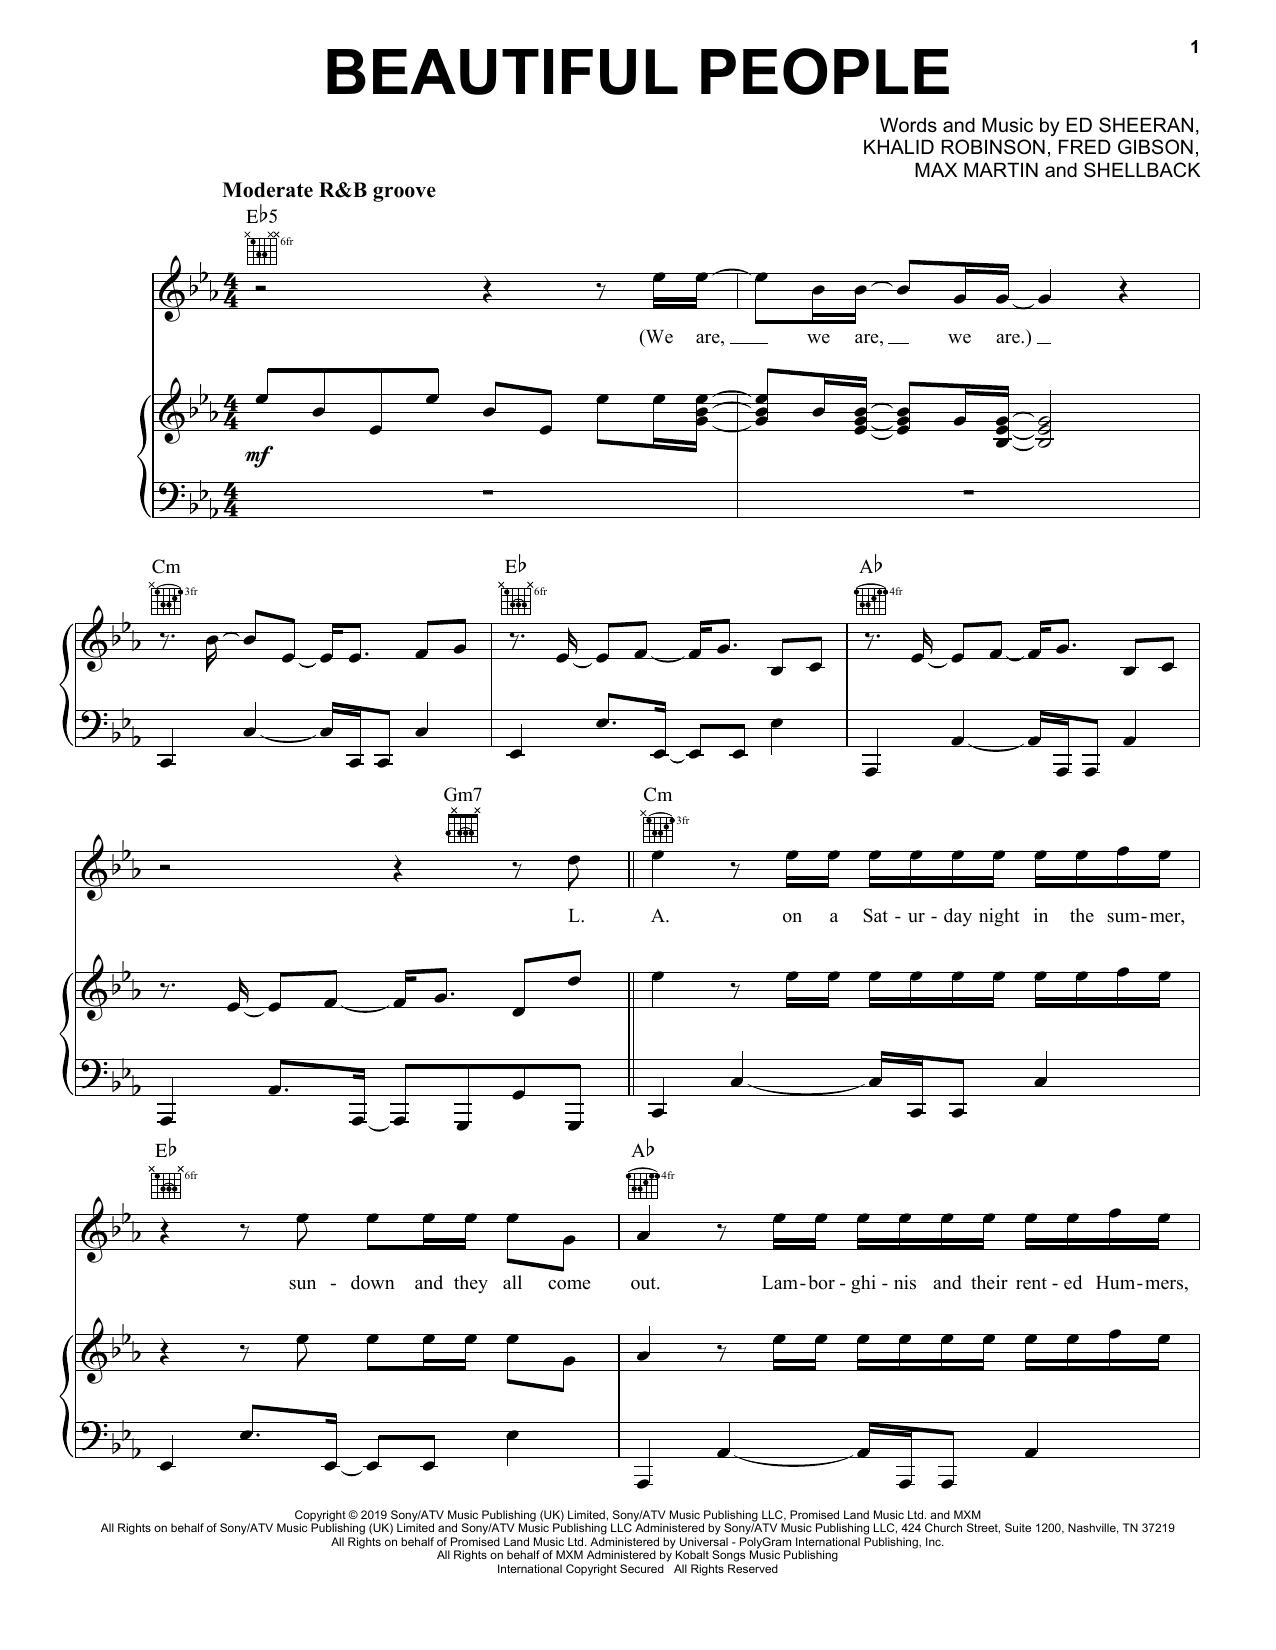 Ed Sheeran Beautiful People (feat. Khalid) sheet music notes and chords. Download Printable PDF.